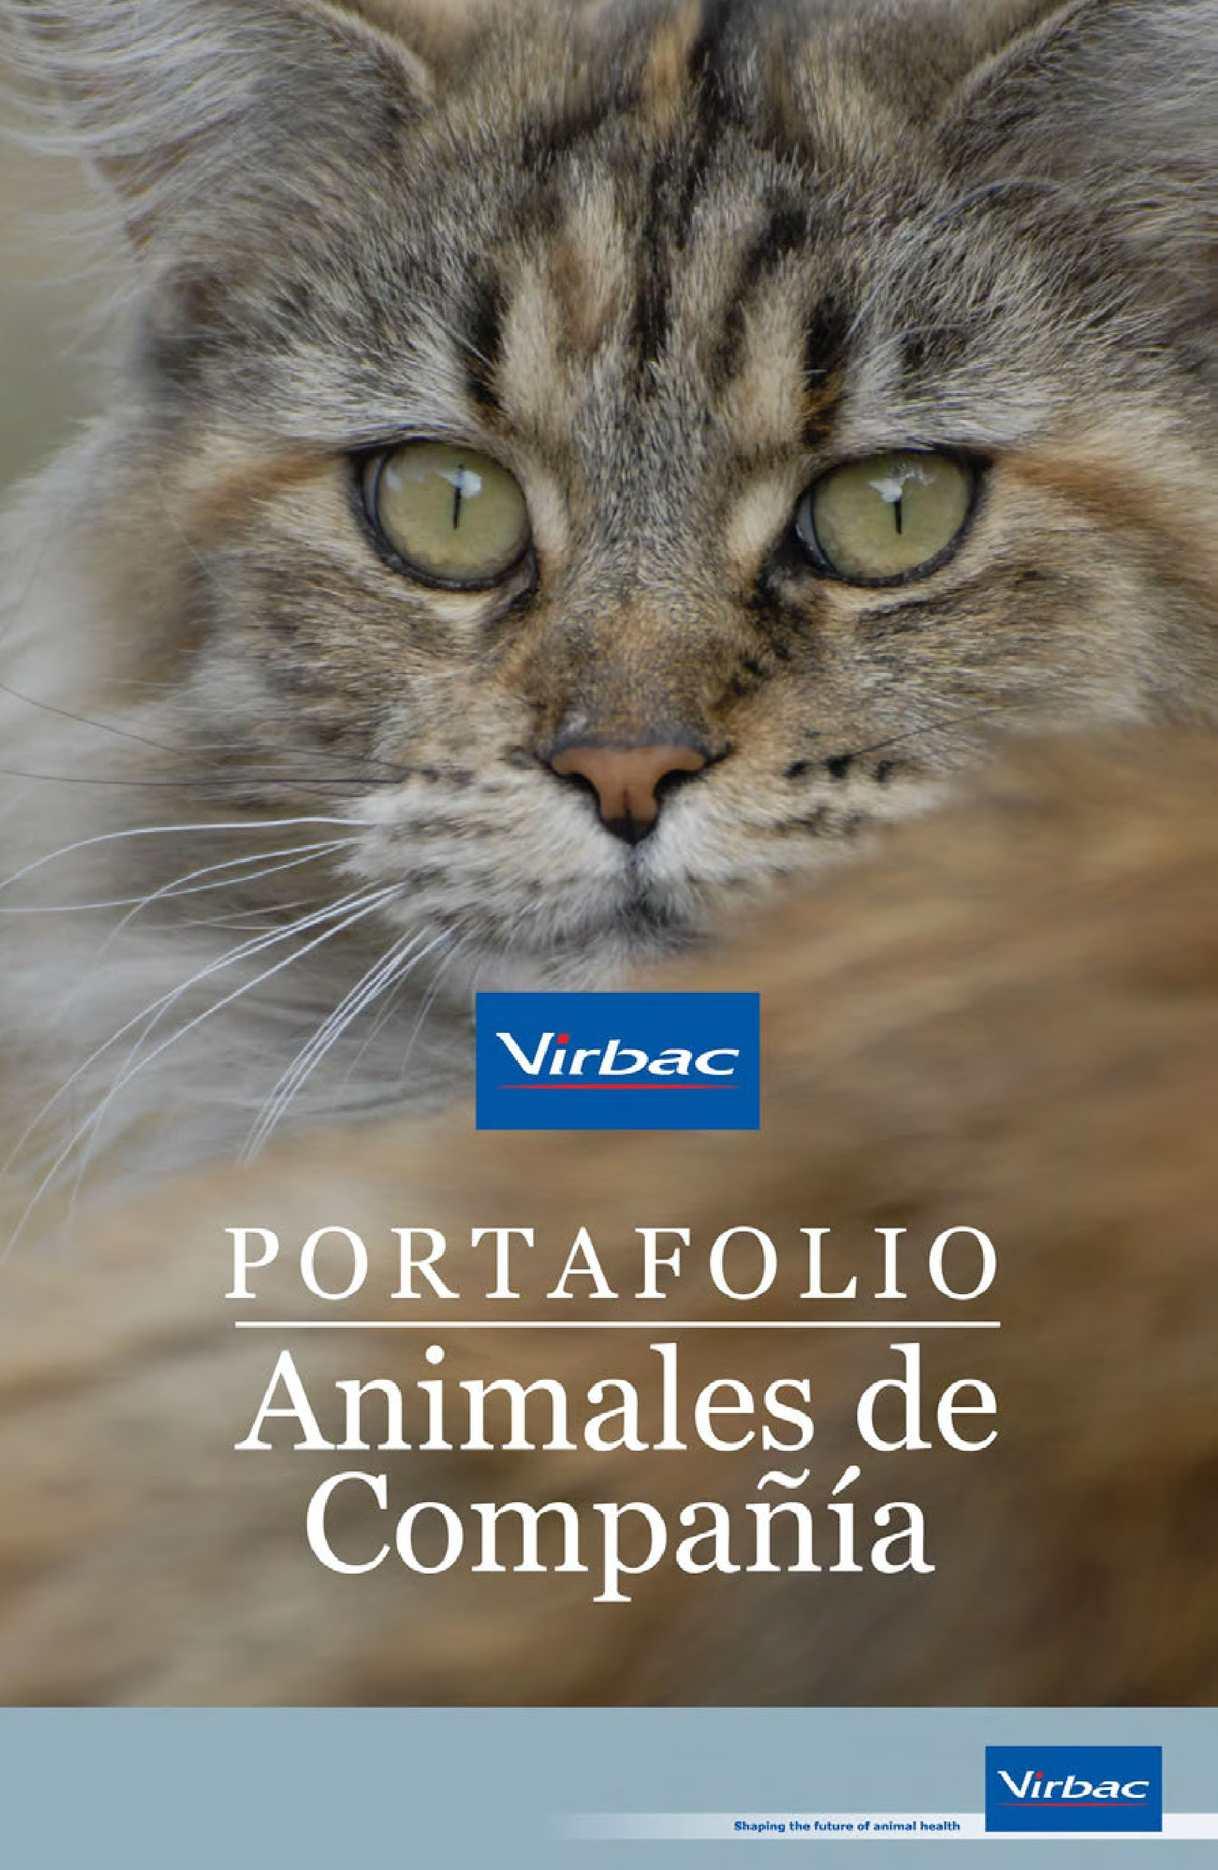 Portafolio Virbac Animales de Compañia